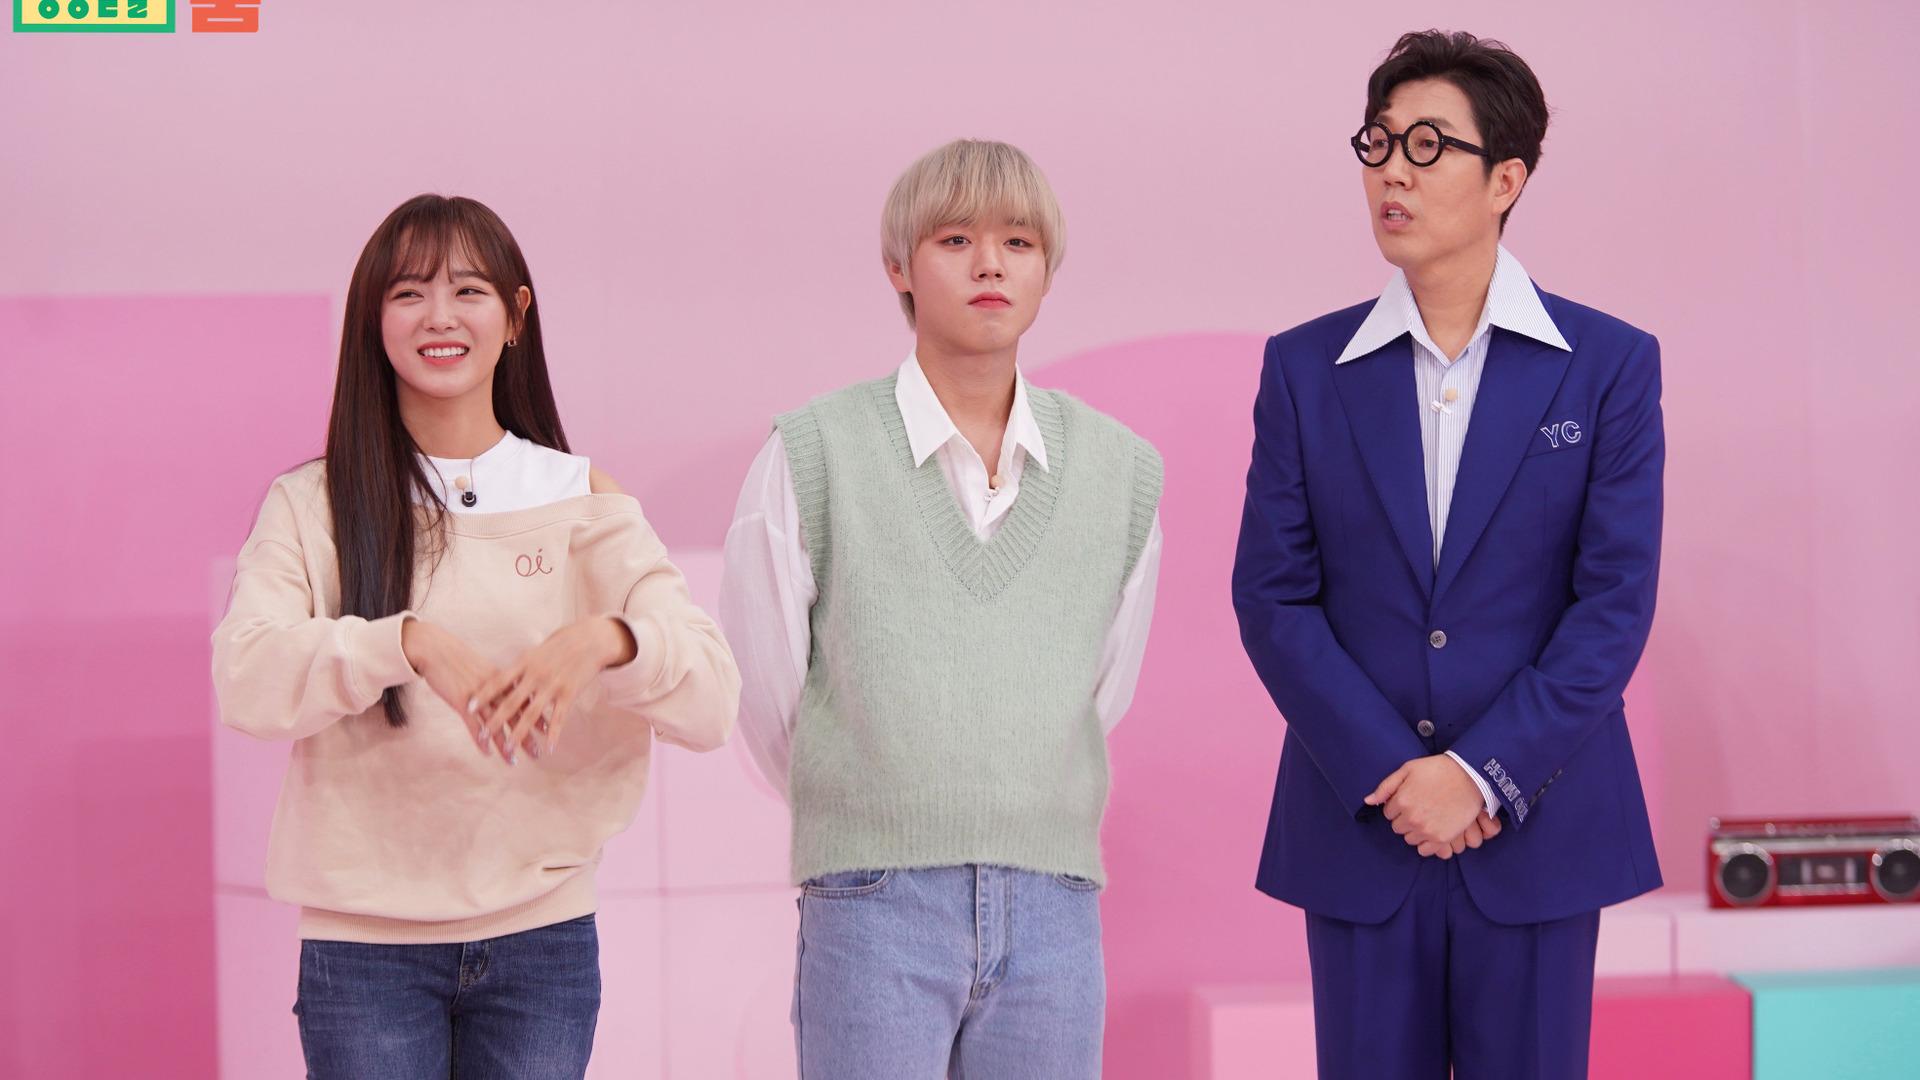 Idol Room — s02e45 — Kim Young-chul, Sejeong (Gugudan) and Park Ji-hoon